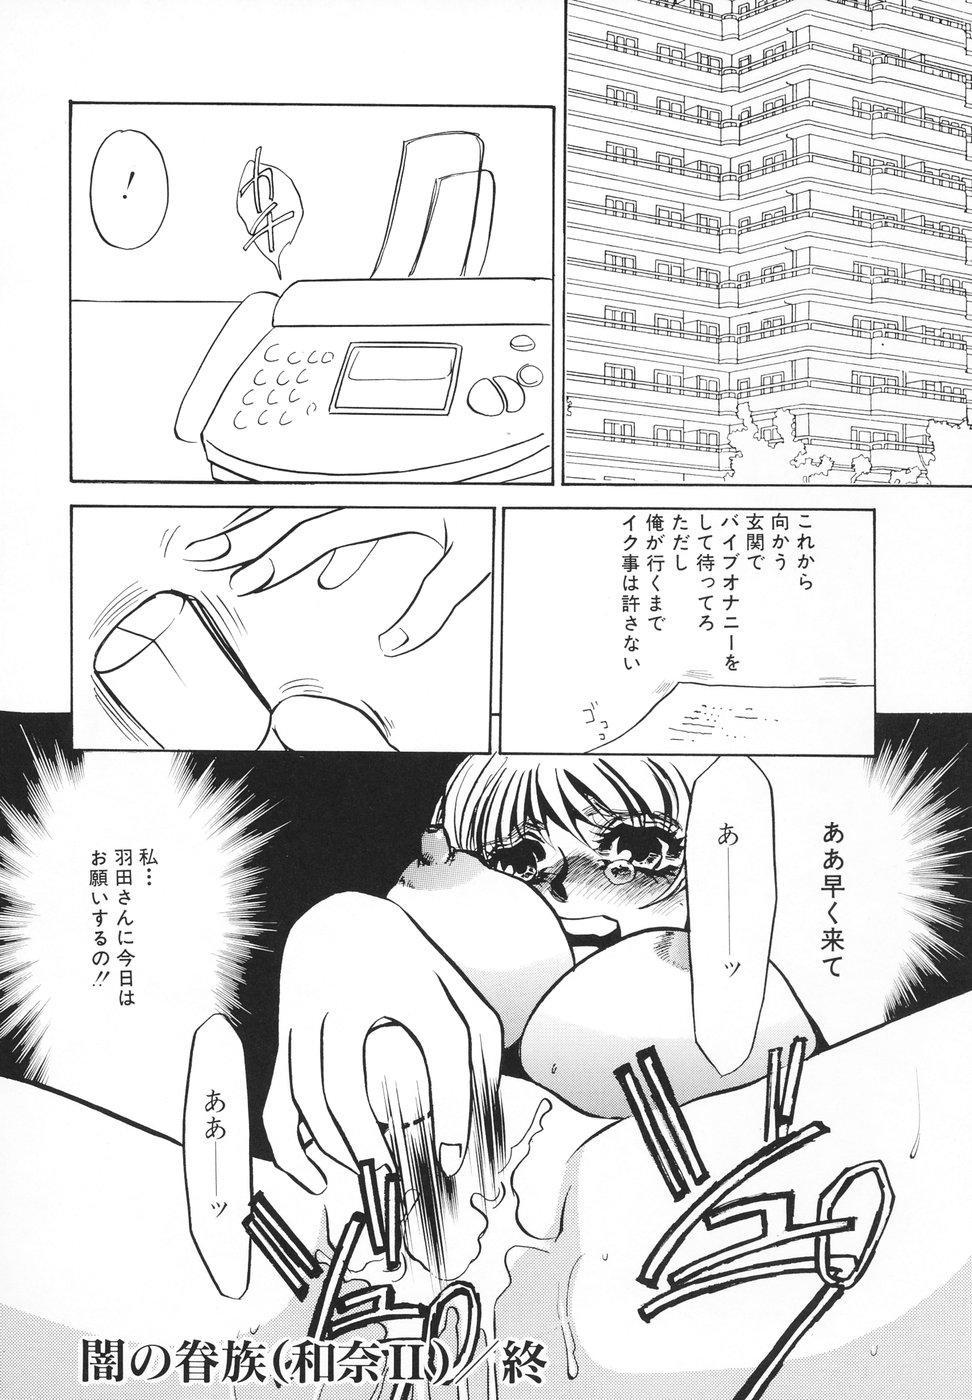 Hentai Inran 72